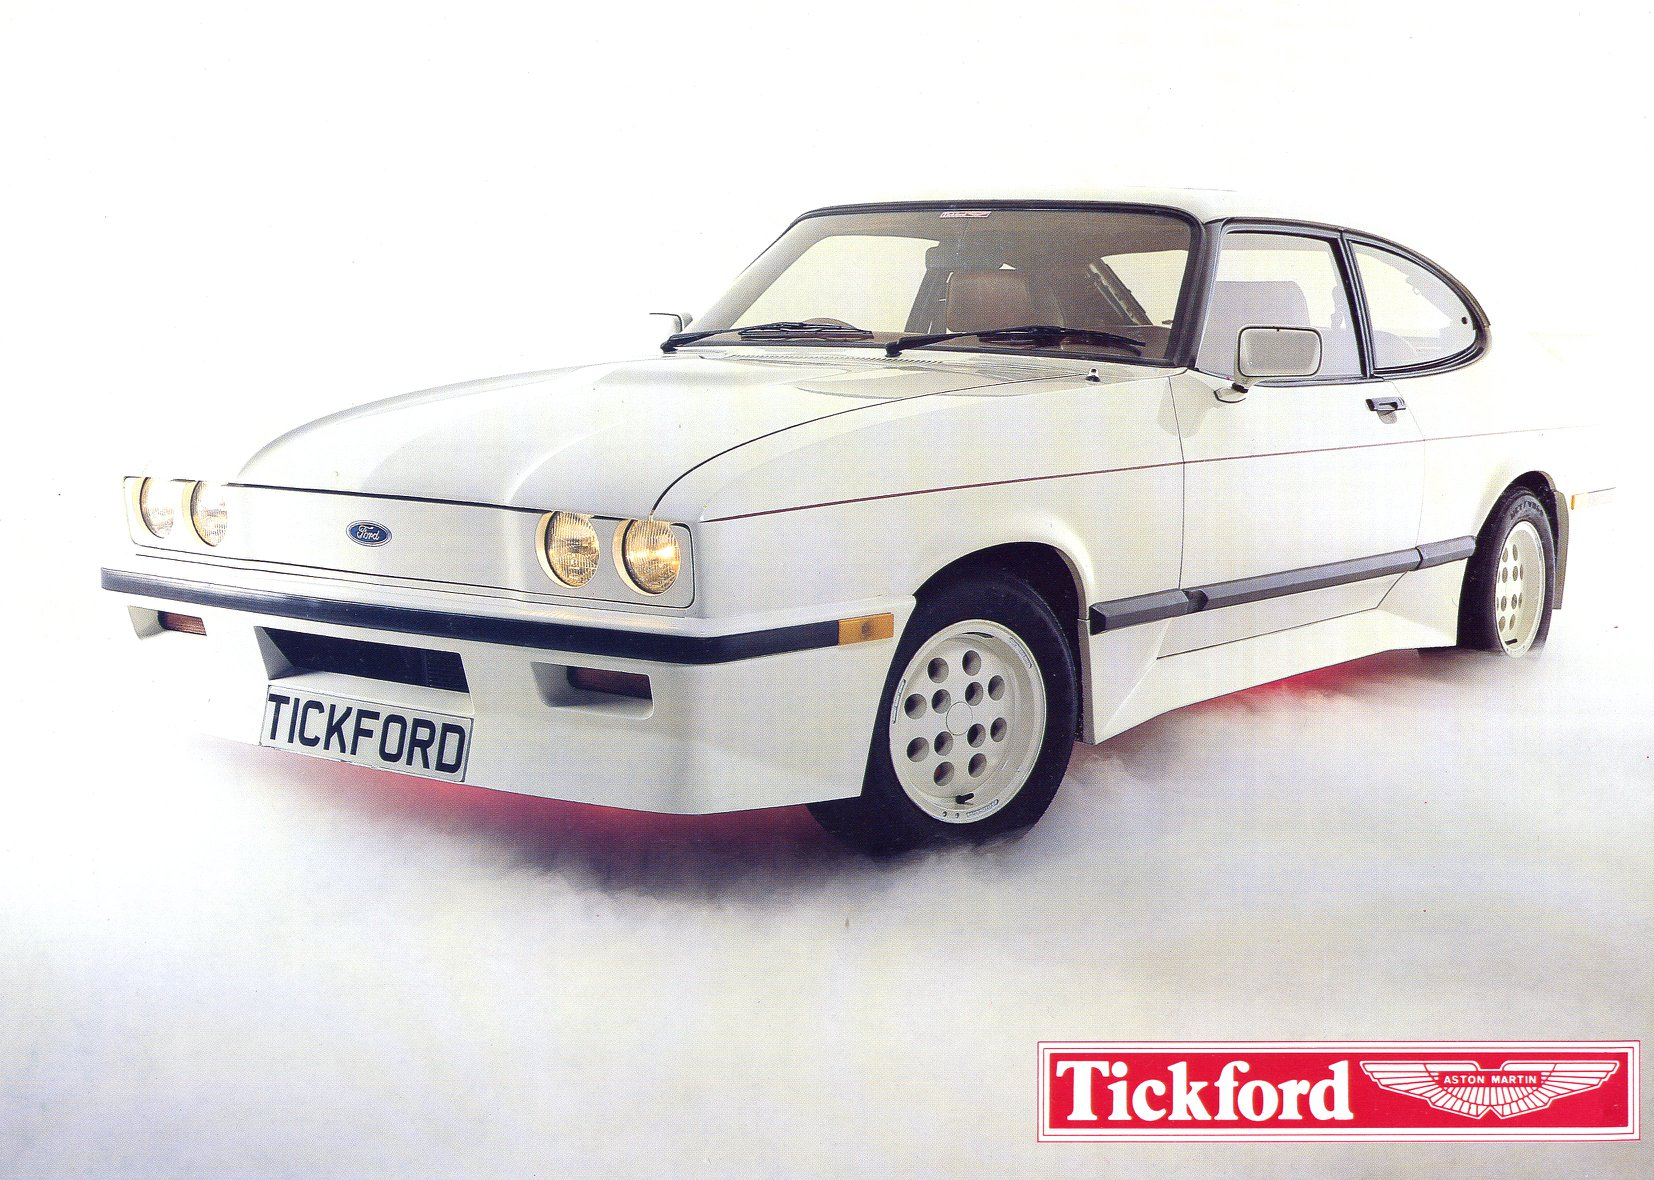 Tickford-brosjyre-12